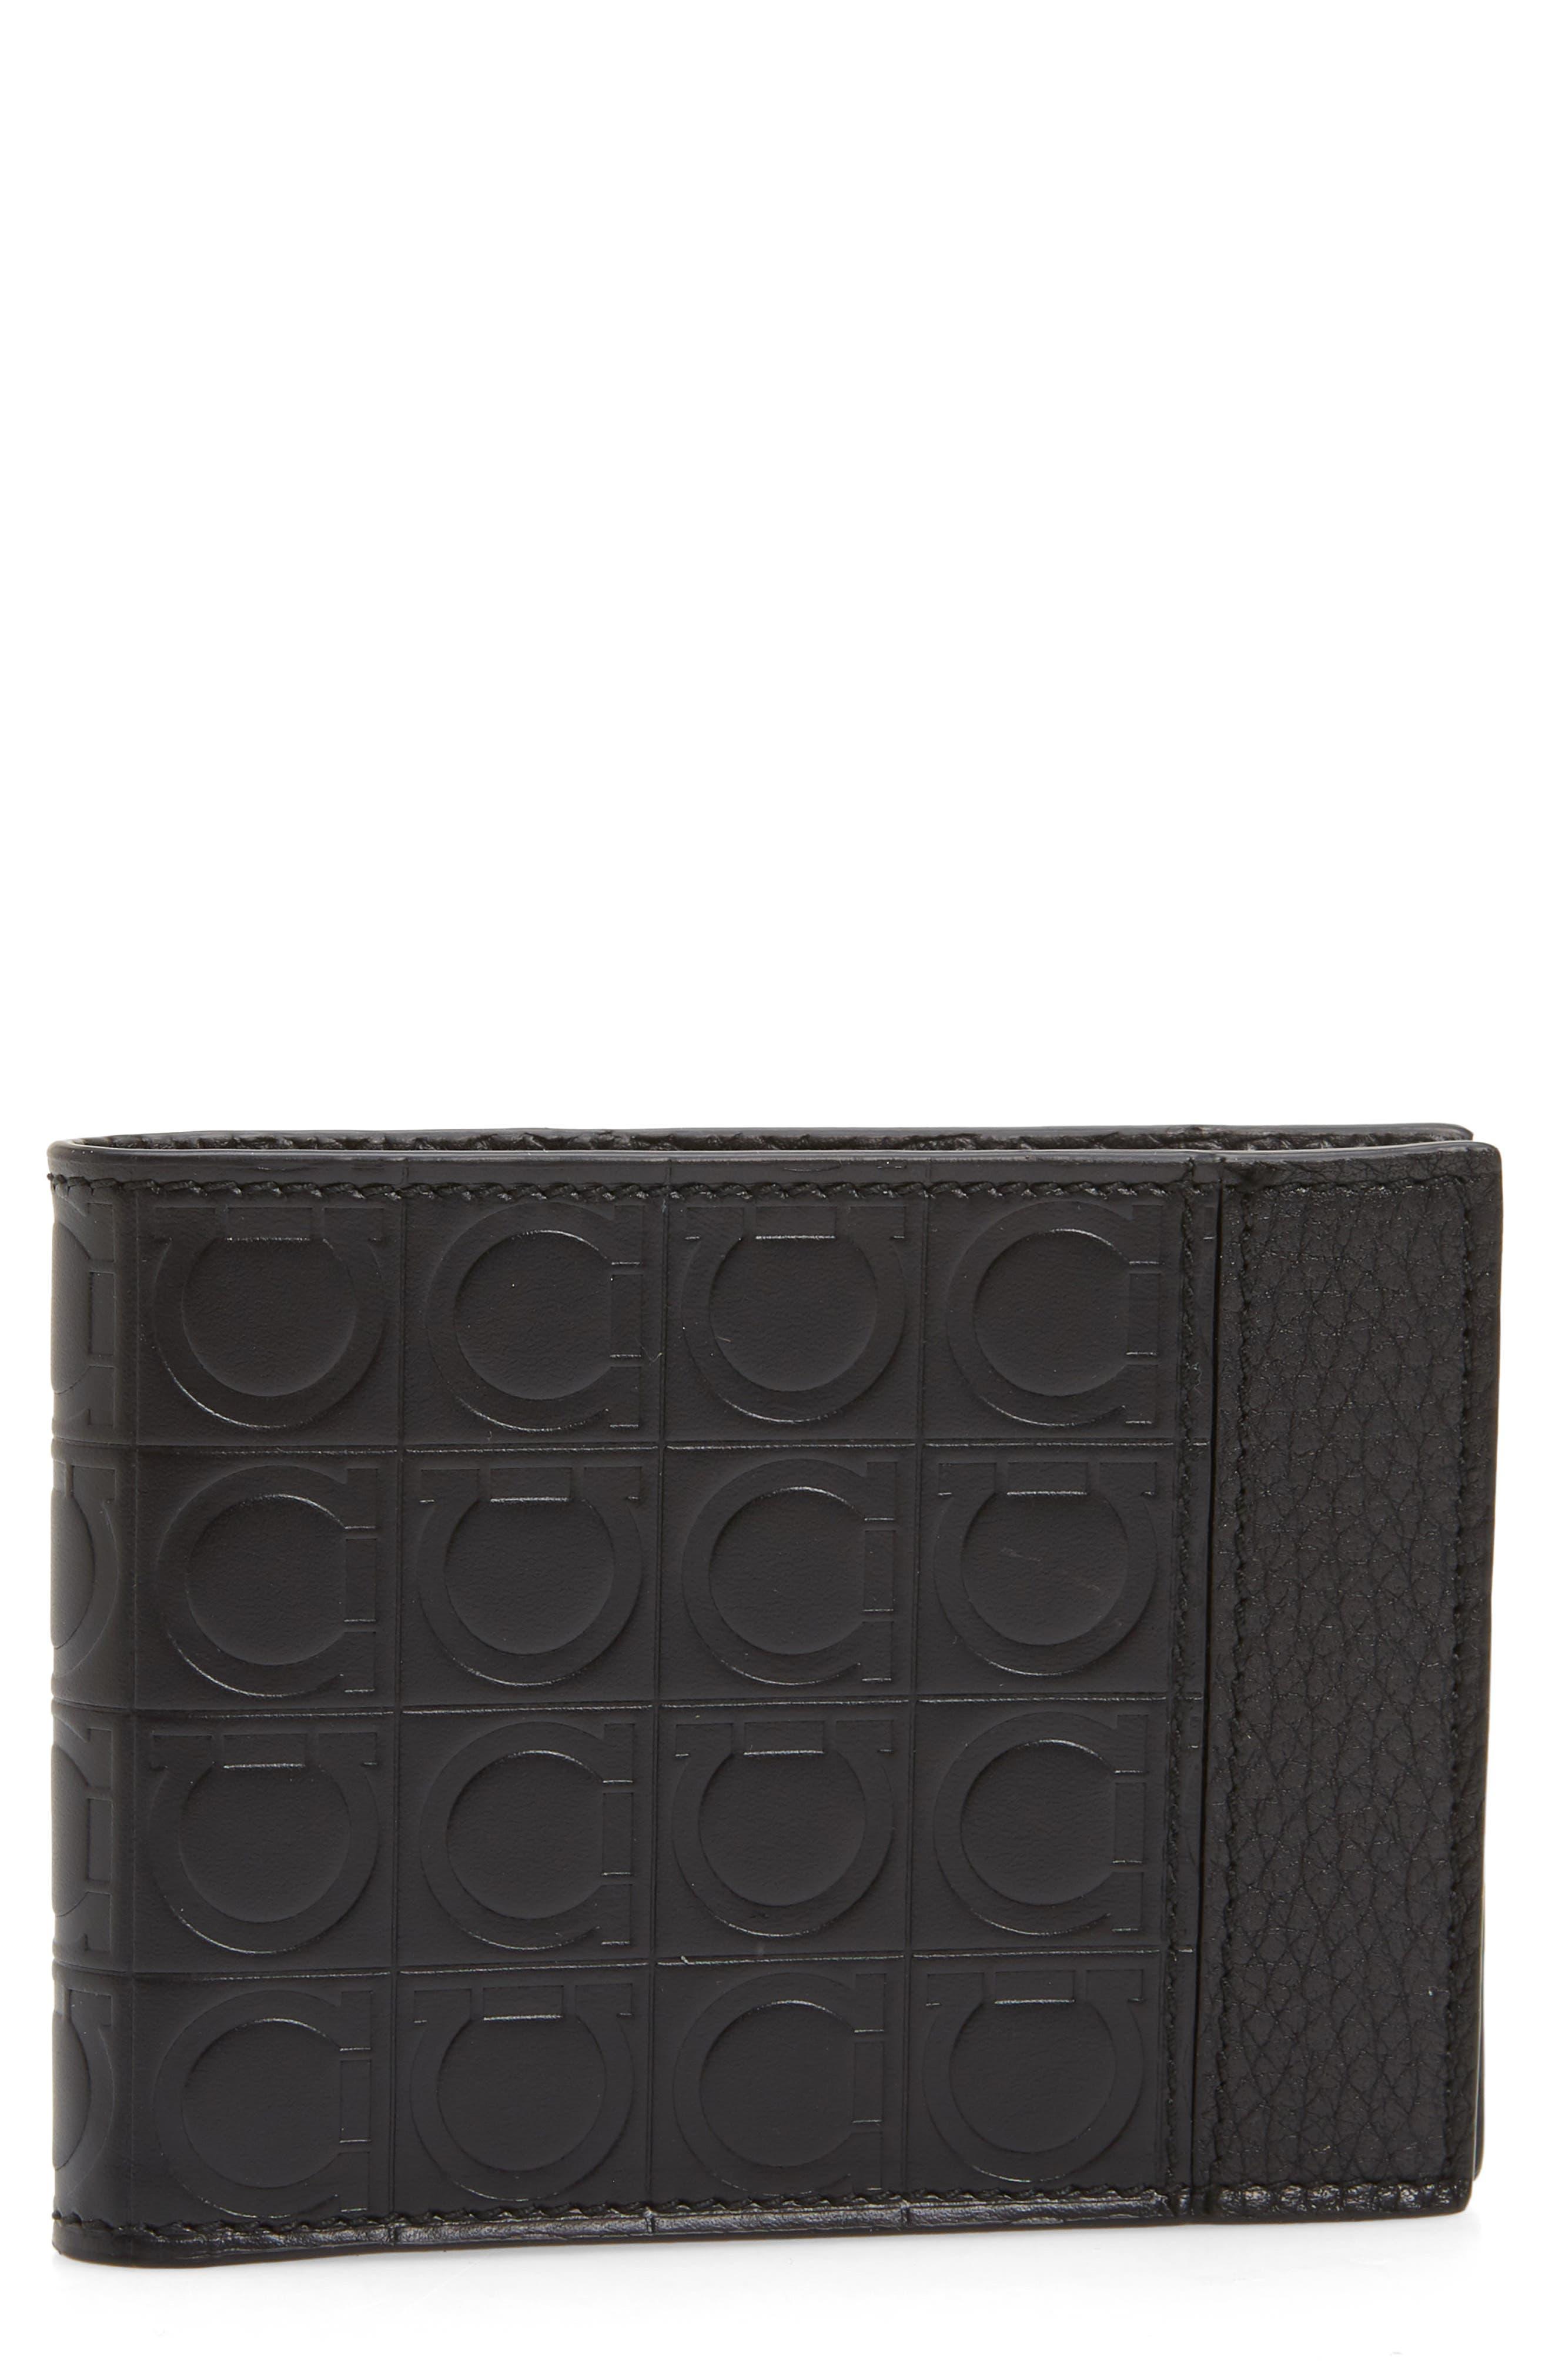 Main Image - Salvatore Ferragamo Firenze Gamma Leather Wallet